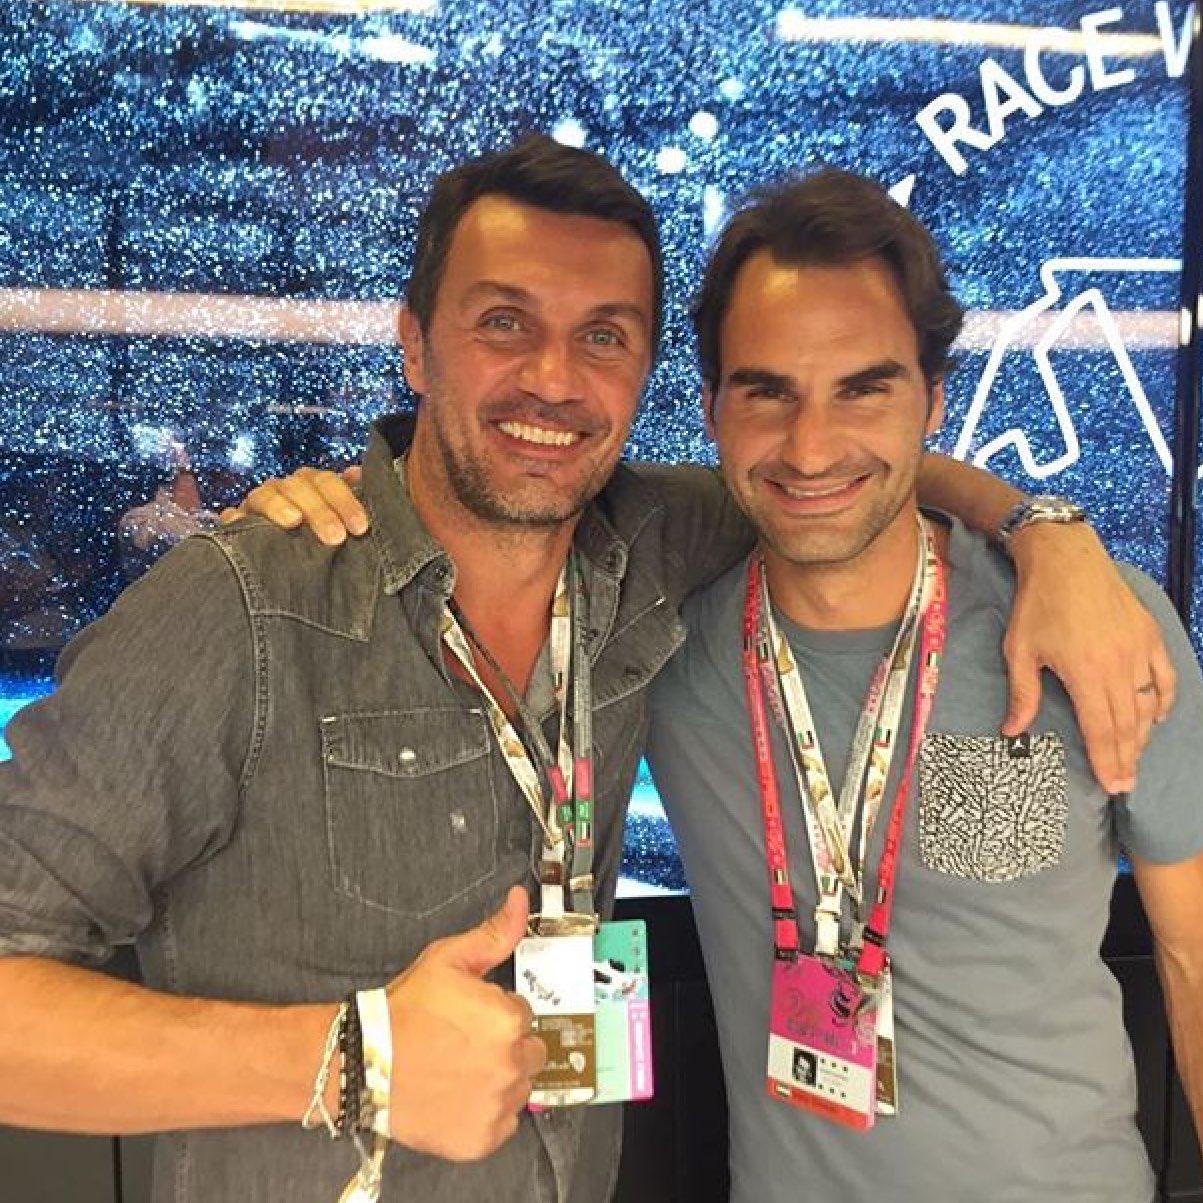 ¿Cuánto mide Paolo Maldini? - Altura - Real height 792c13b20f61a9a105657f2abfb09157